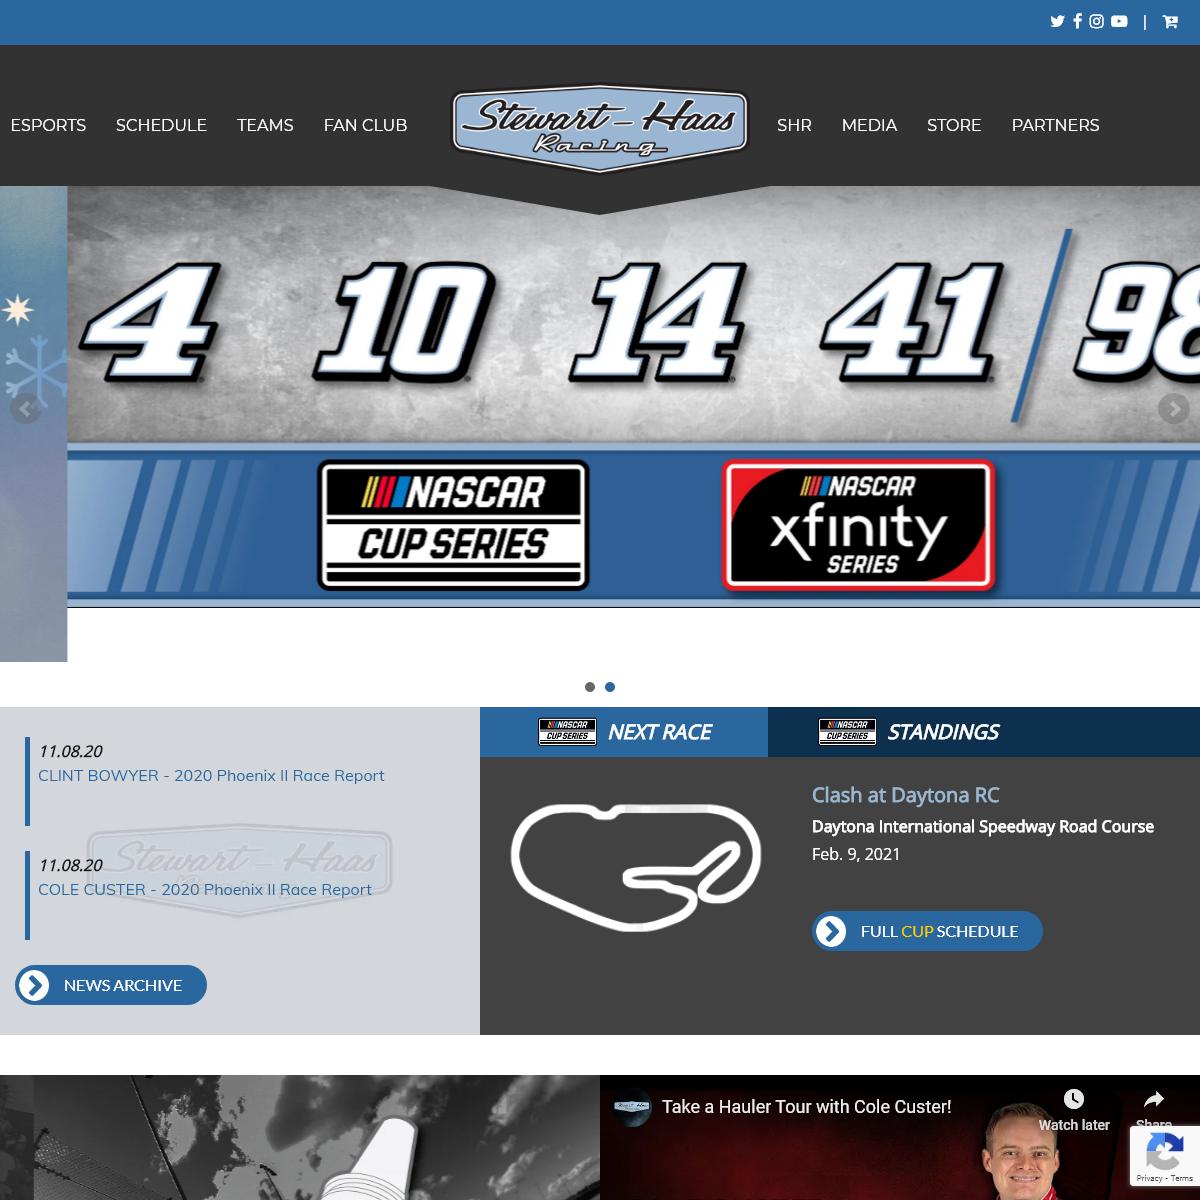 The Official Stewart-Haas Racing Website